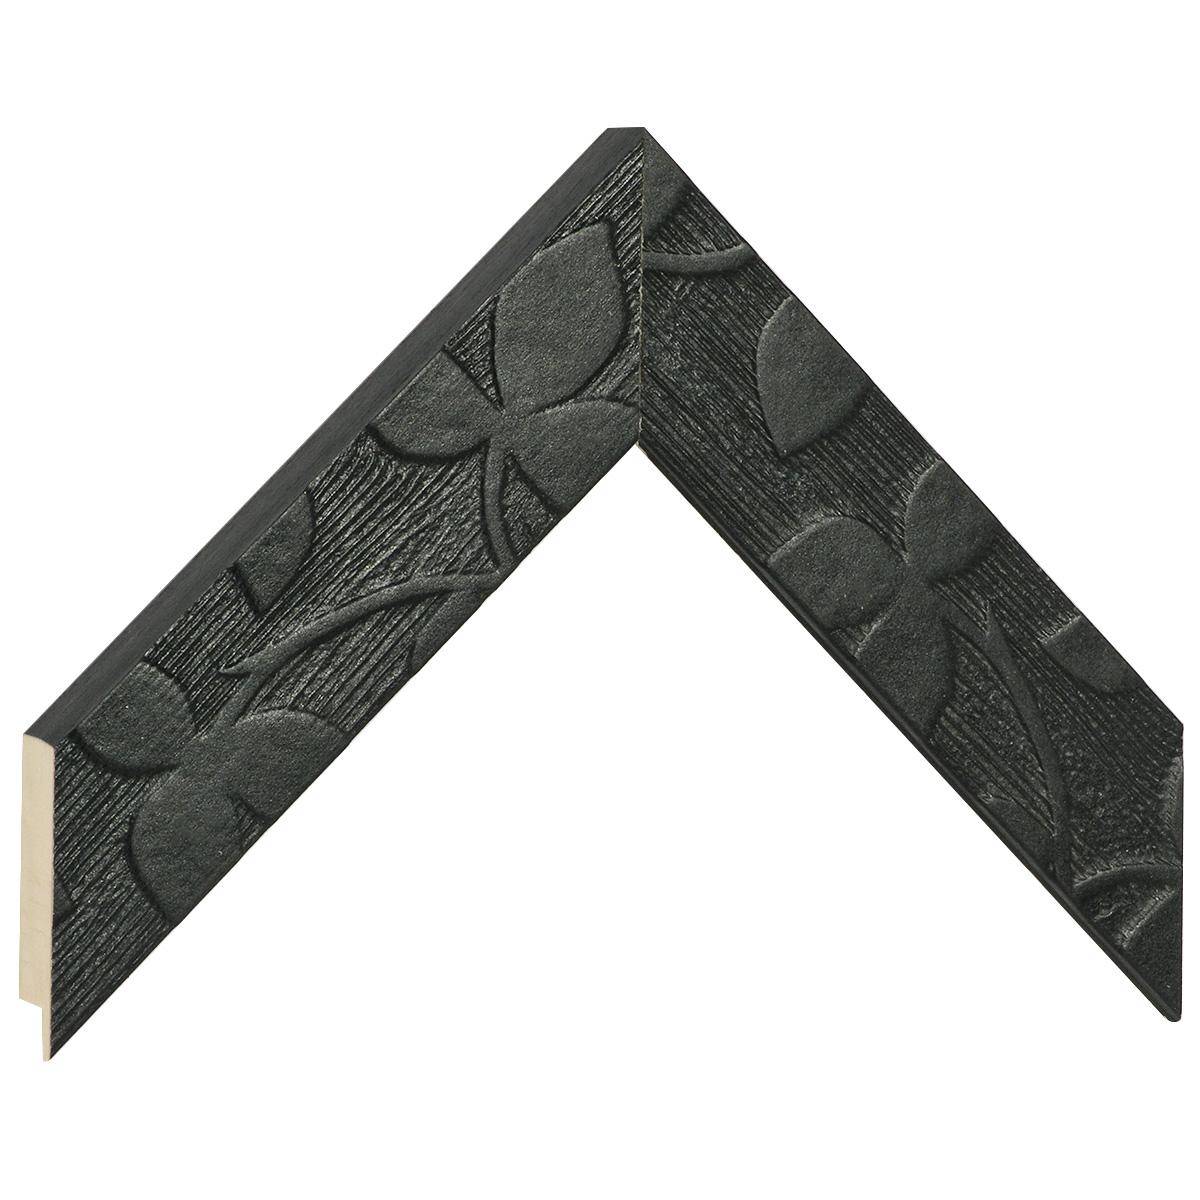 Moulding fir width 40mm heigth 19mm - black